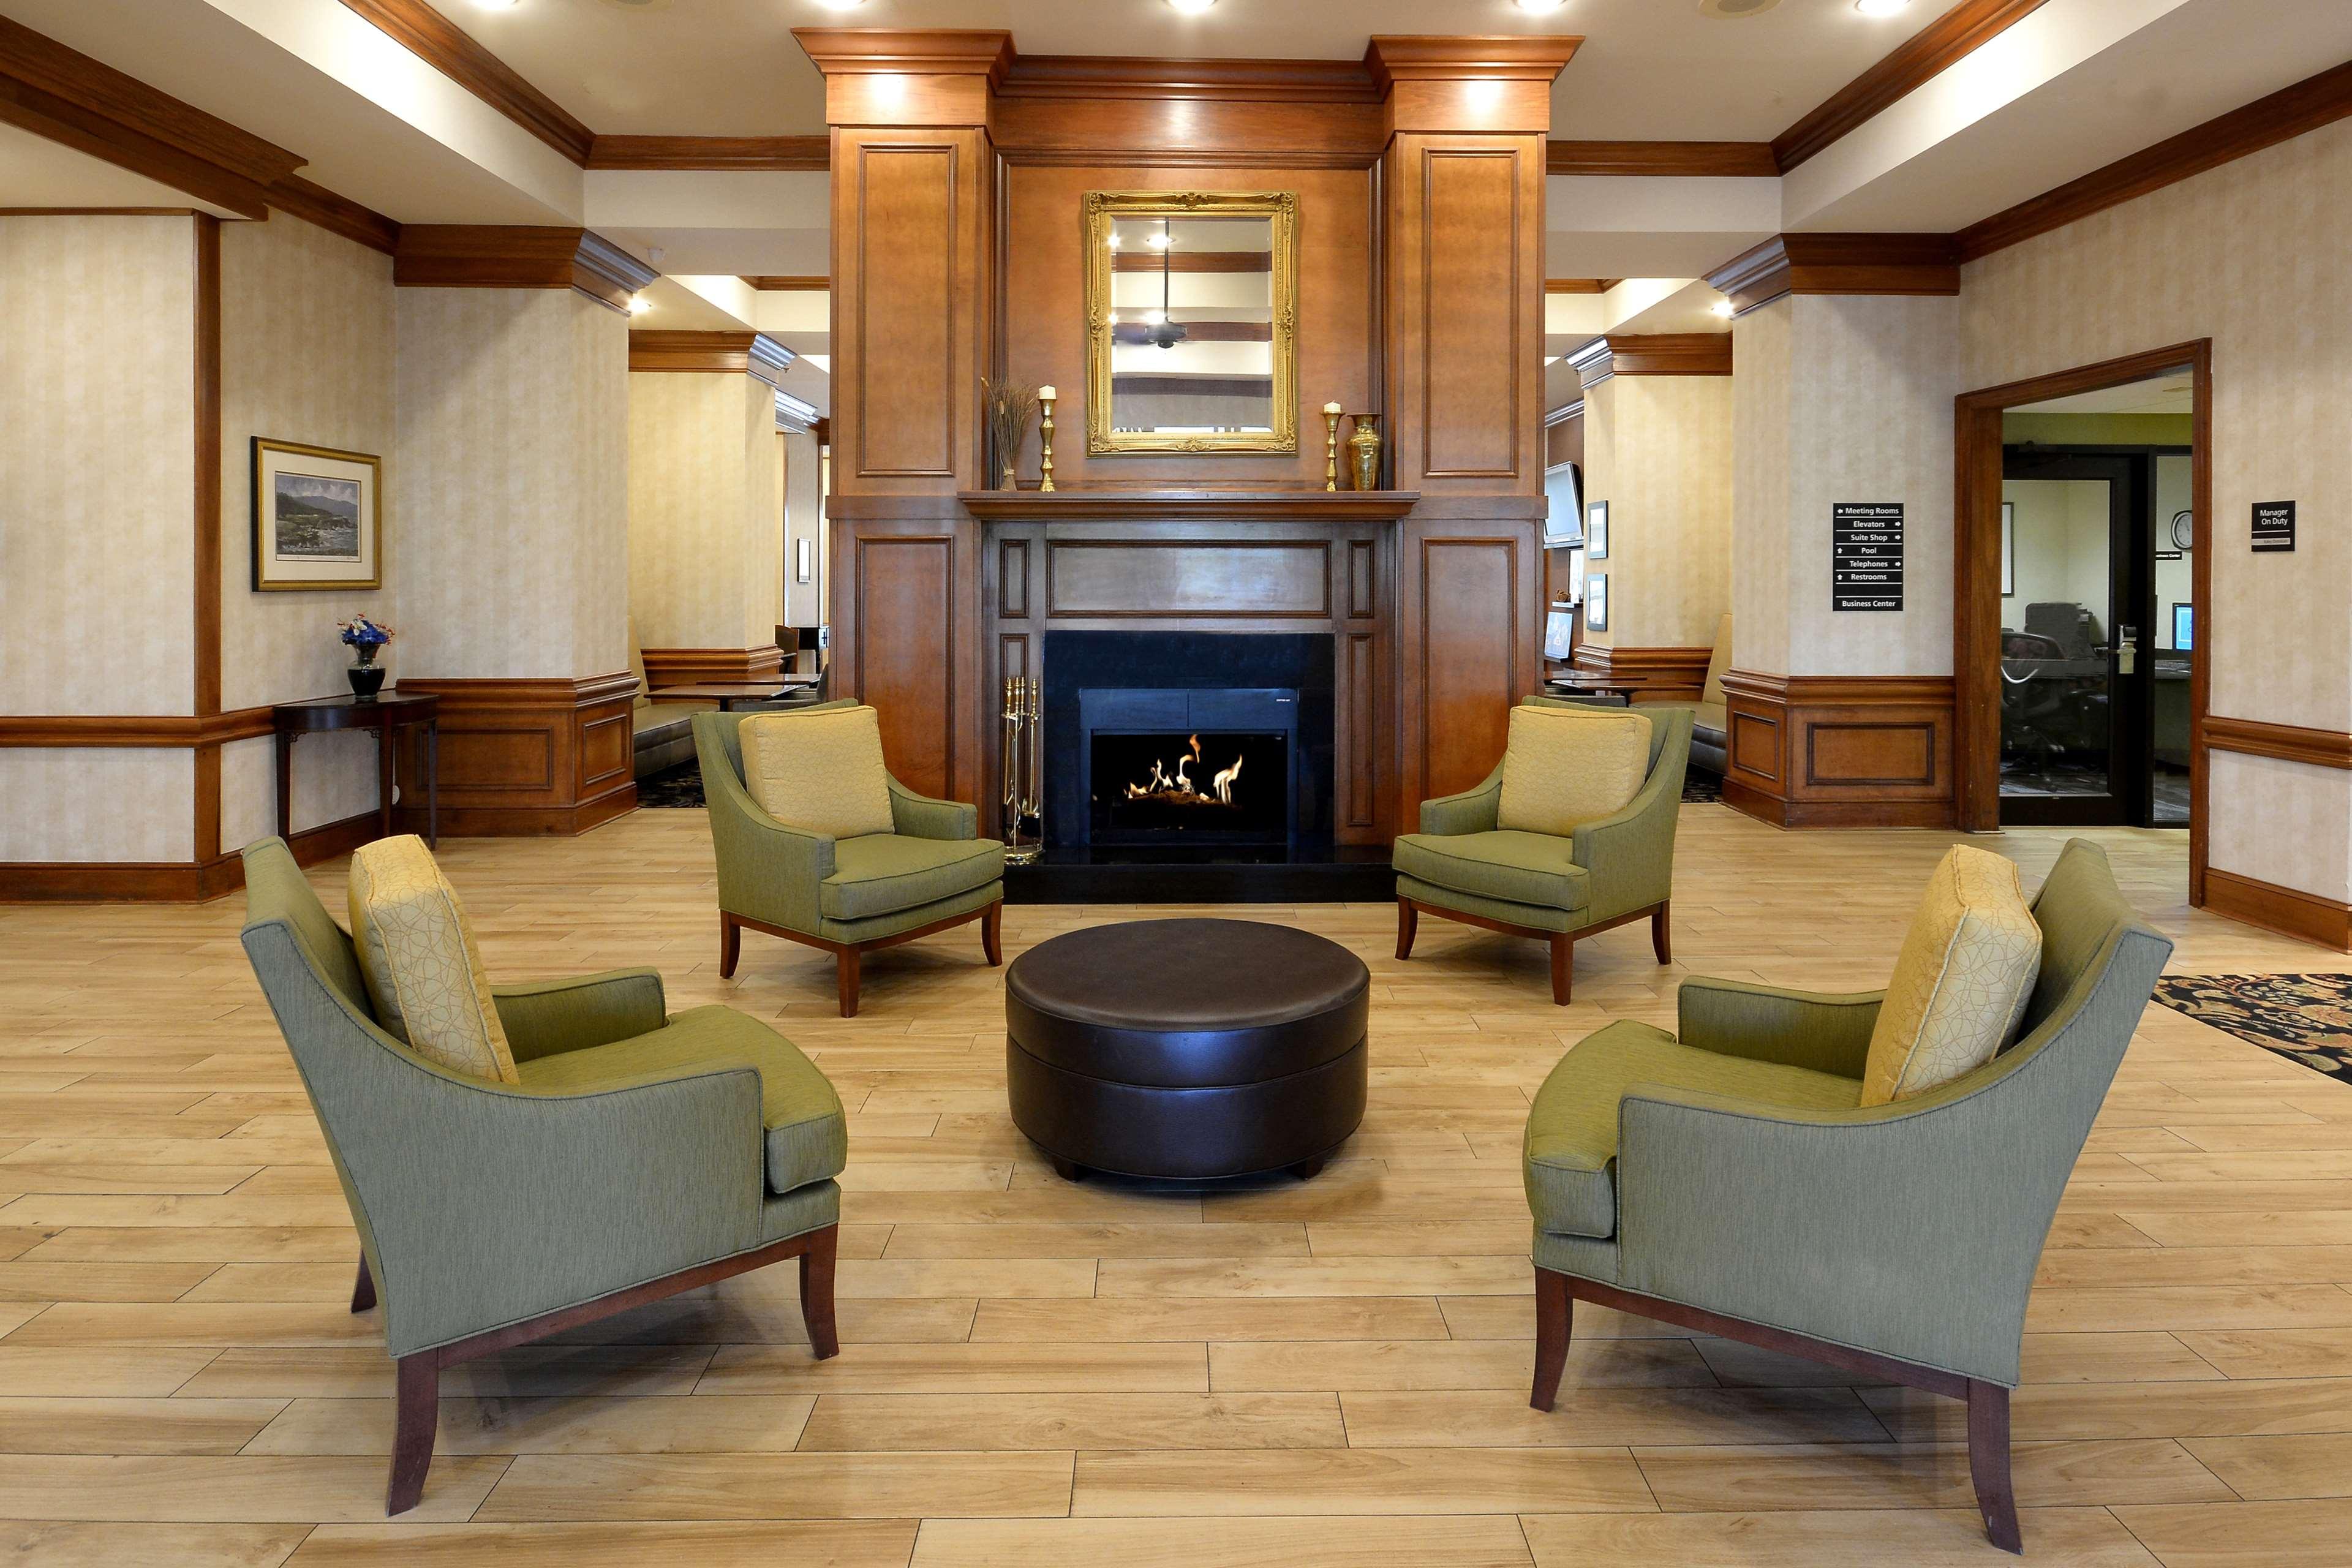 Hampton Inn & Suites Greenville/Spartanburg I-85 image 10